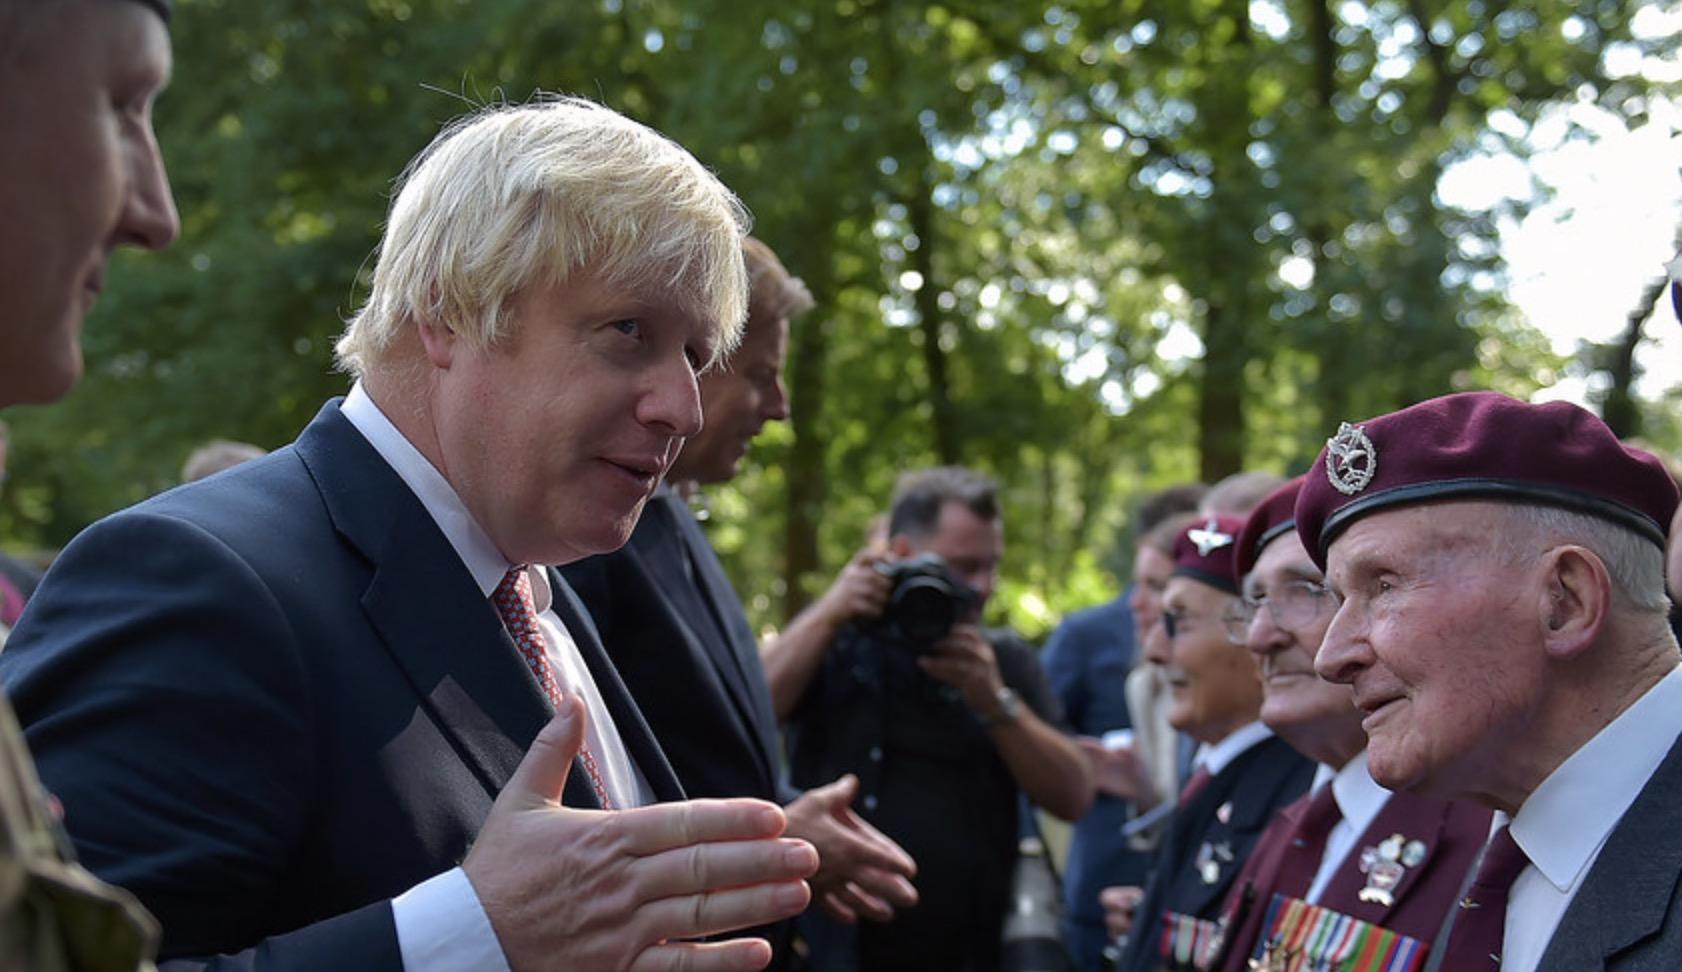 Boris Johnson, Tories Set For Landslide According To UK Election Exit Polls